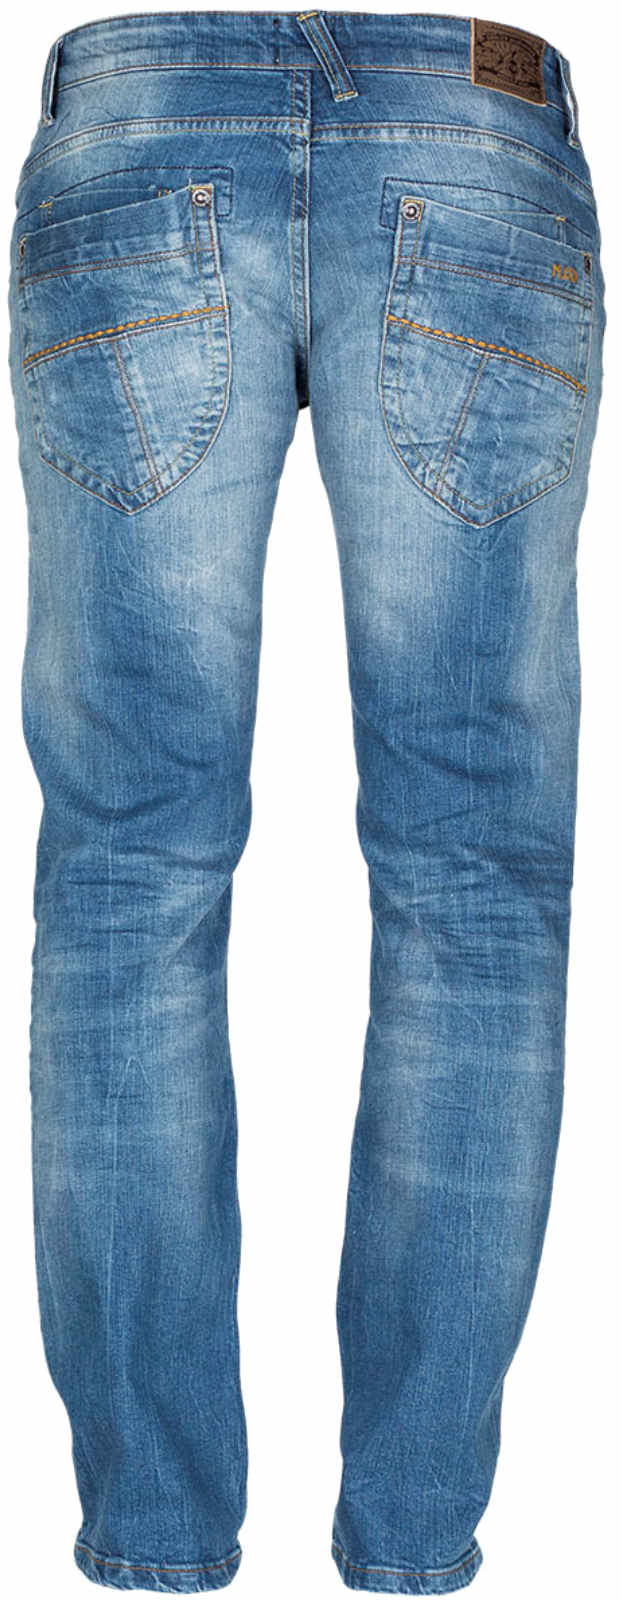 m o d herren jeans joshua comfort sp16 1008 low waist neu. Black Bedroom Furniture Sets. Home Design Ideas